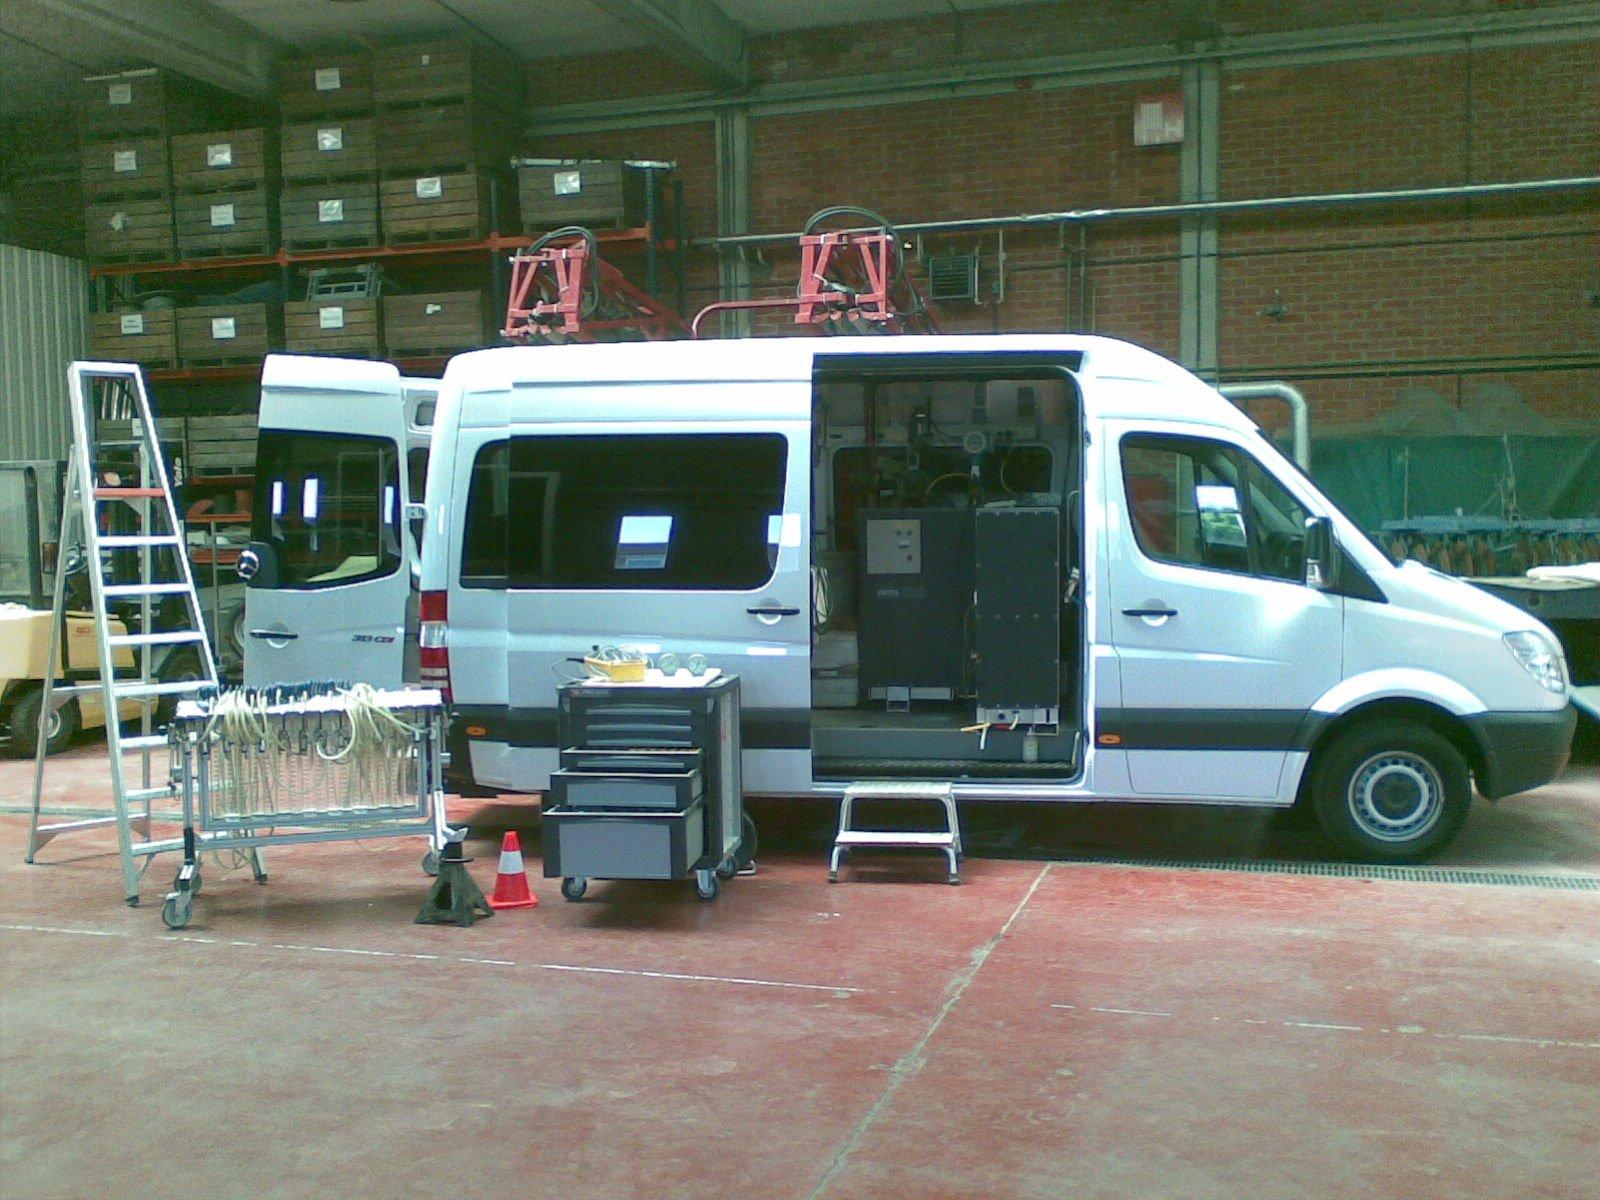 Sprayer inspection van